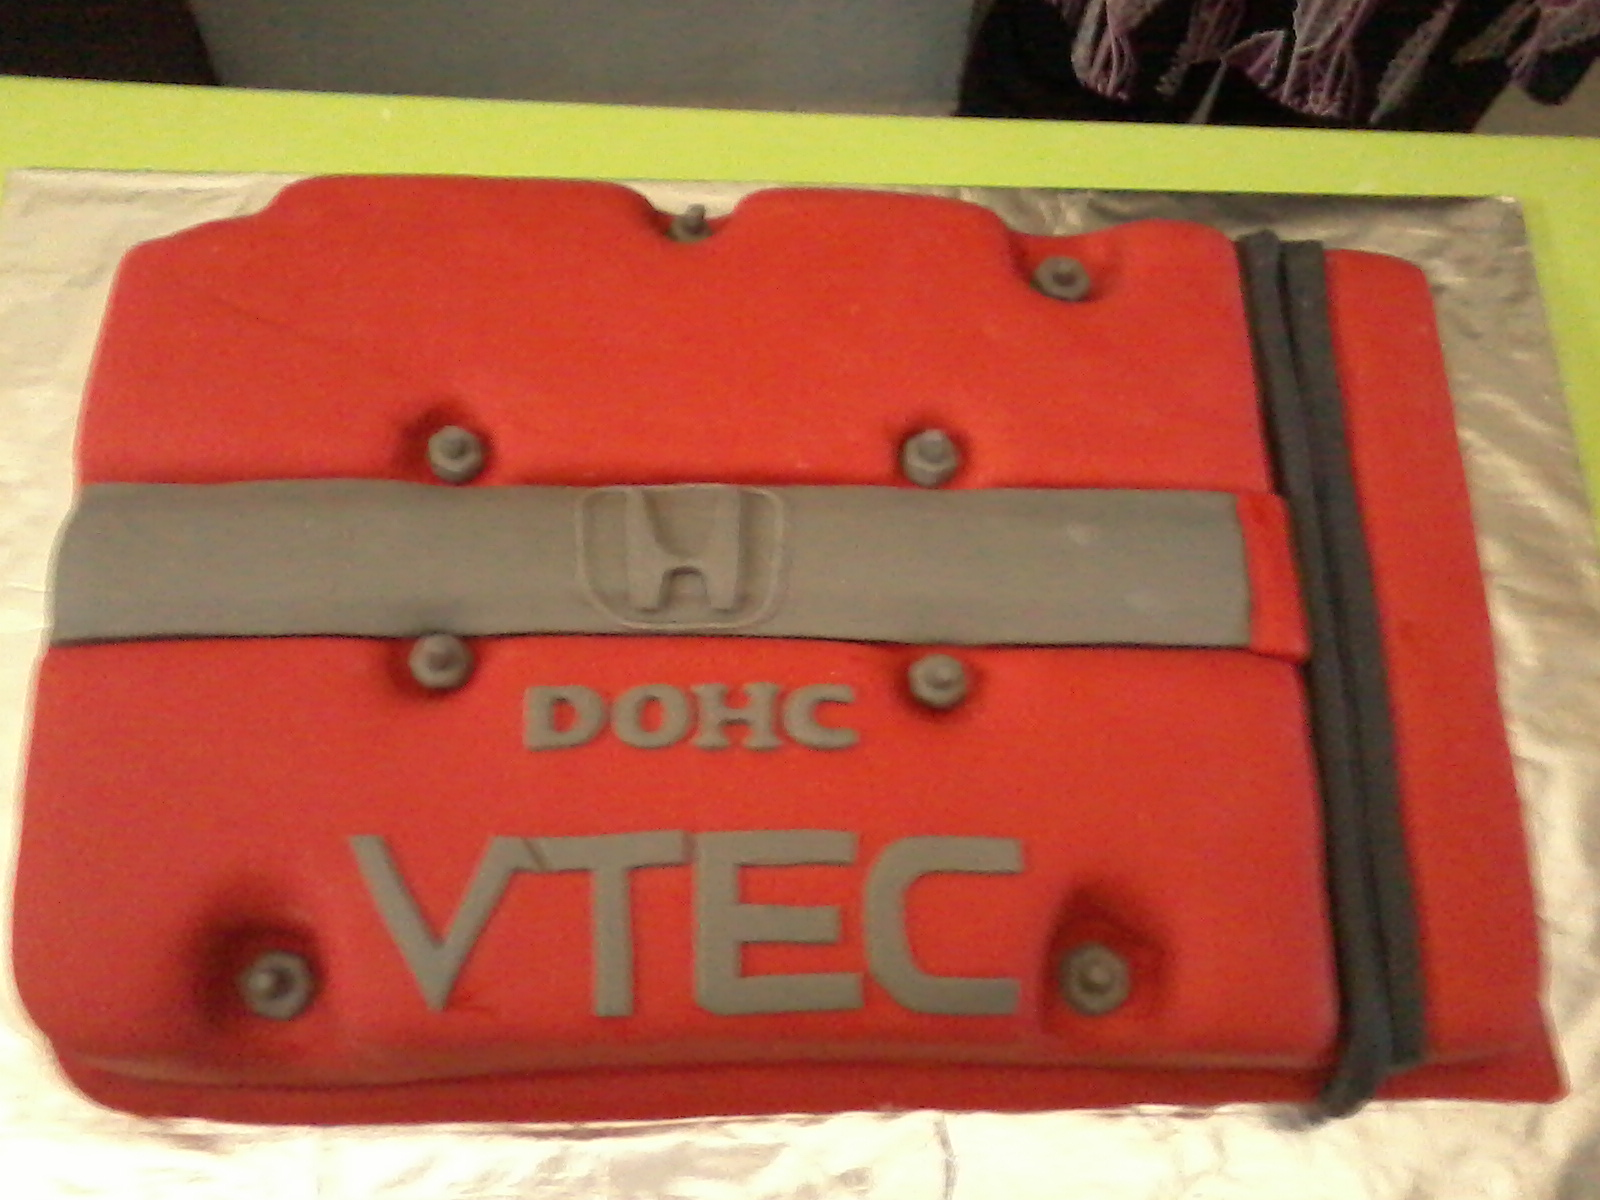 jujucupcakes Honda Vtec Engine cake and sport car accessories figurine